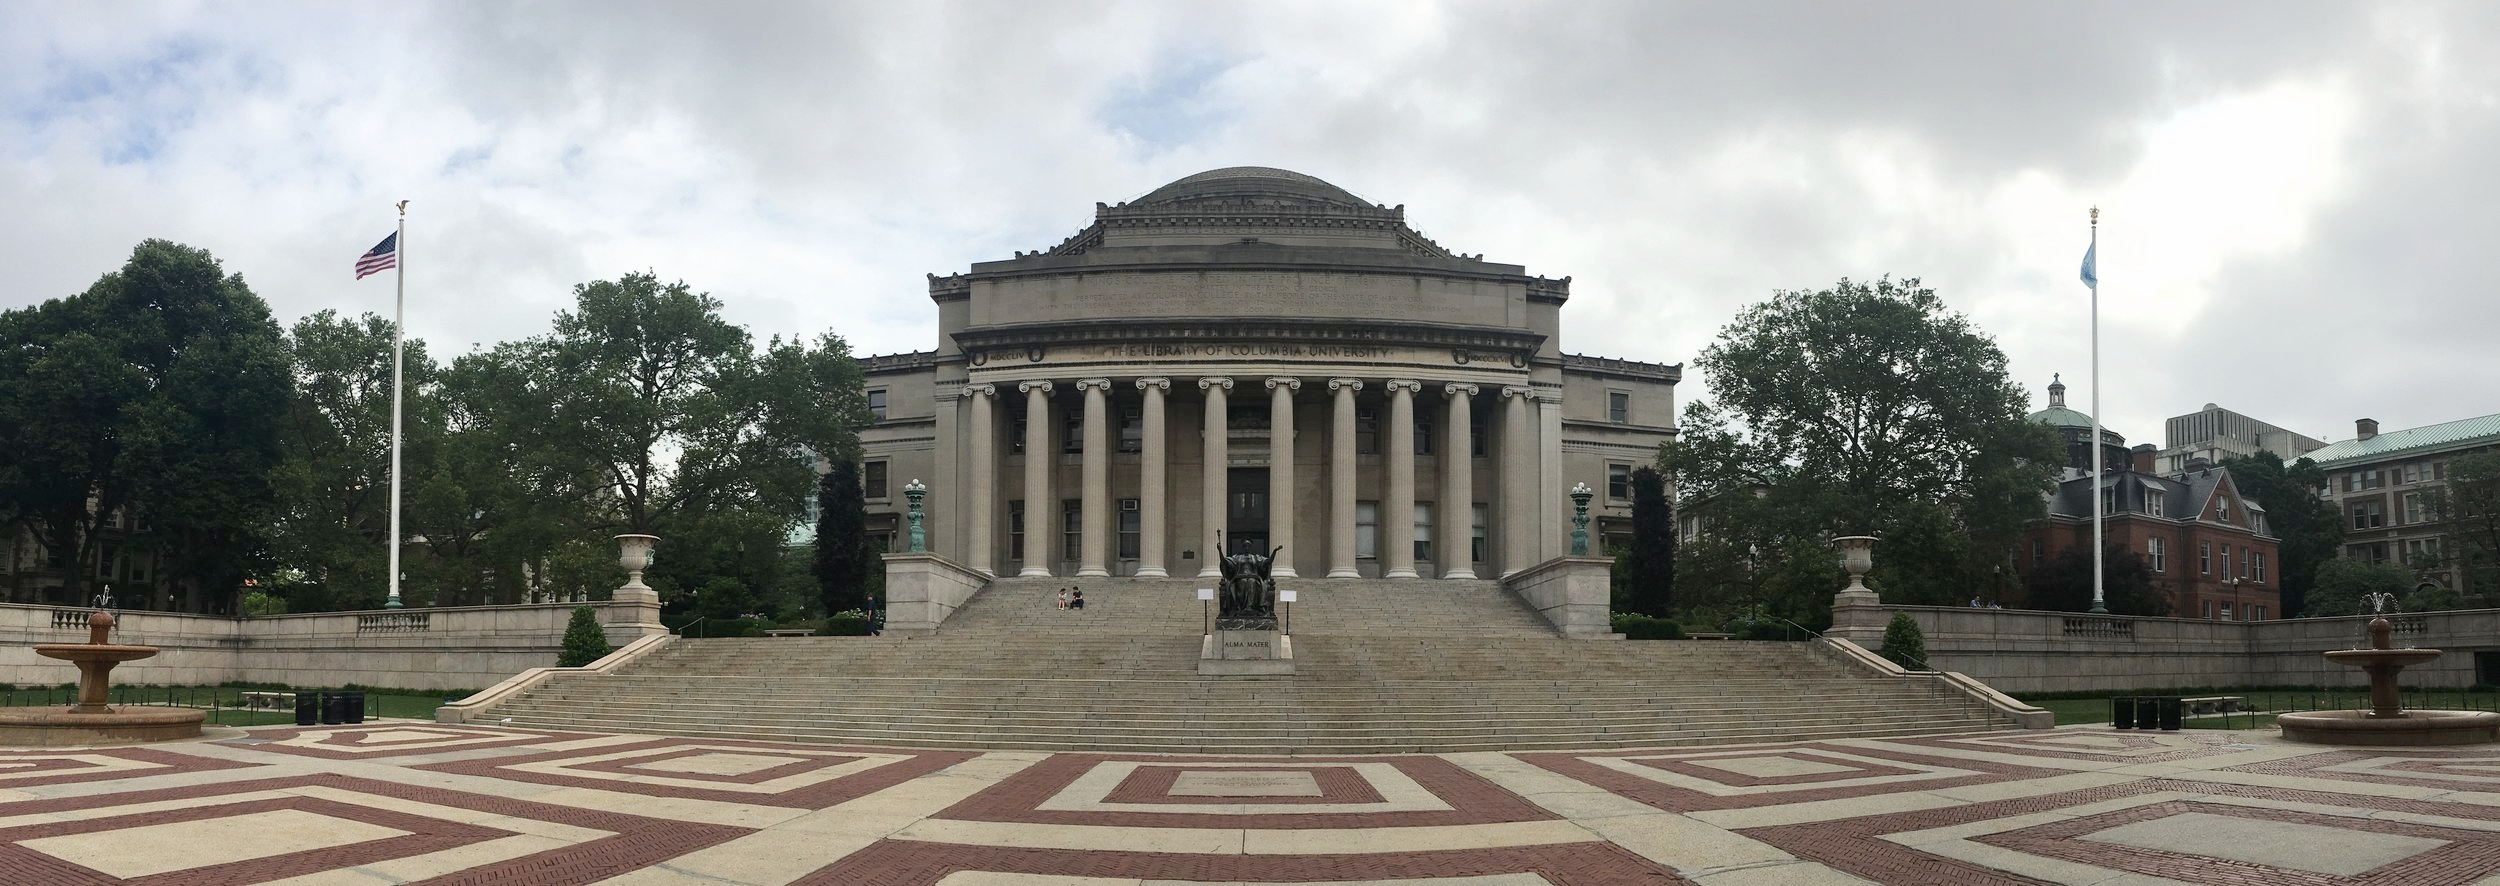 University of Columbia, Low Memorial Library (Photo: M. Alhadeff-Jones, 2017)